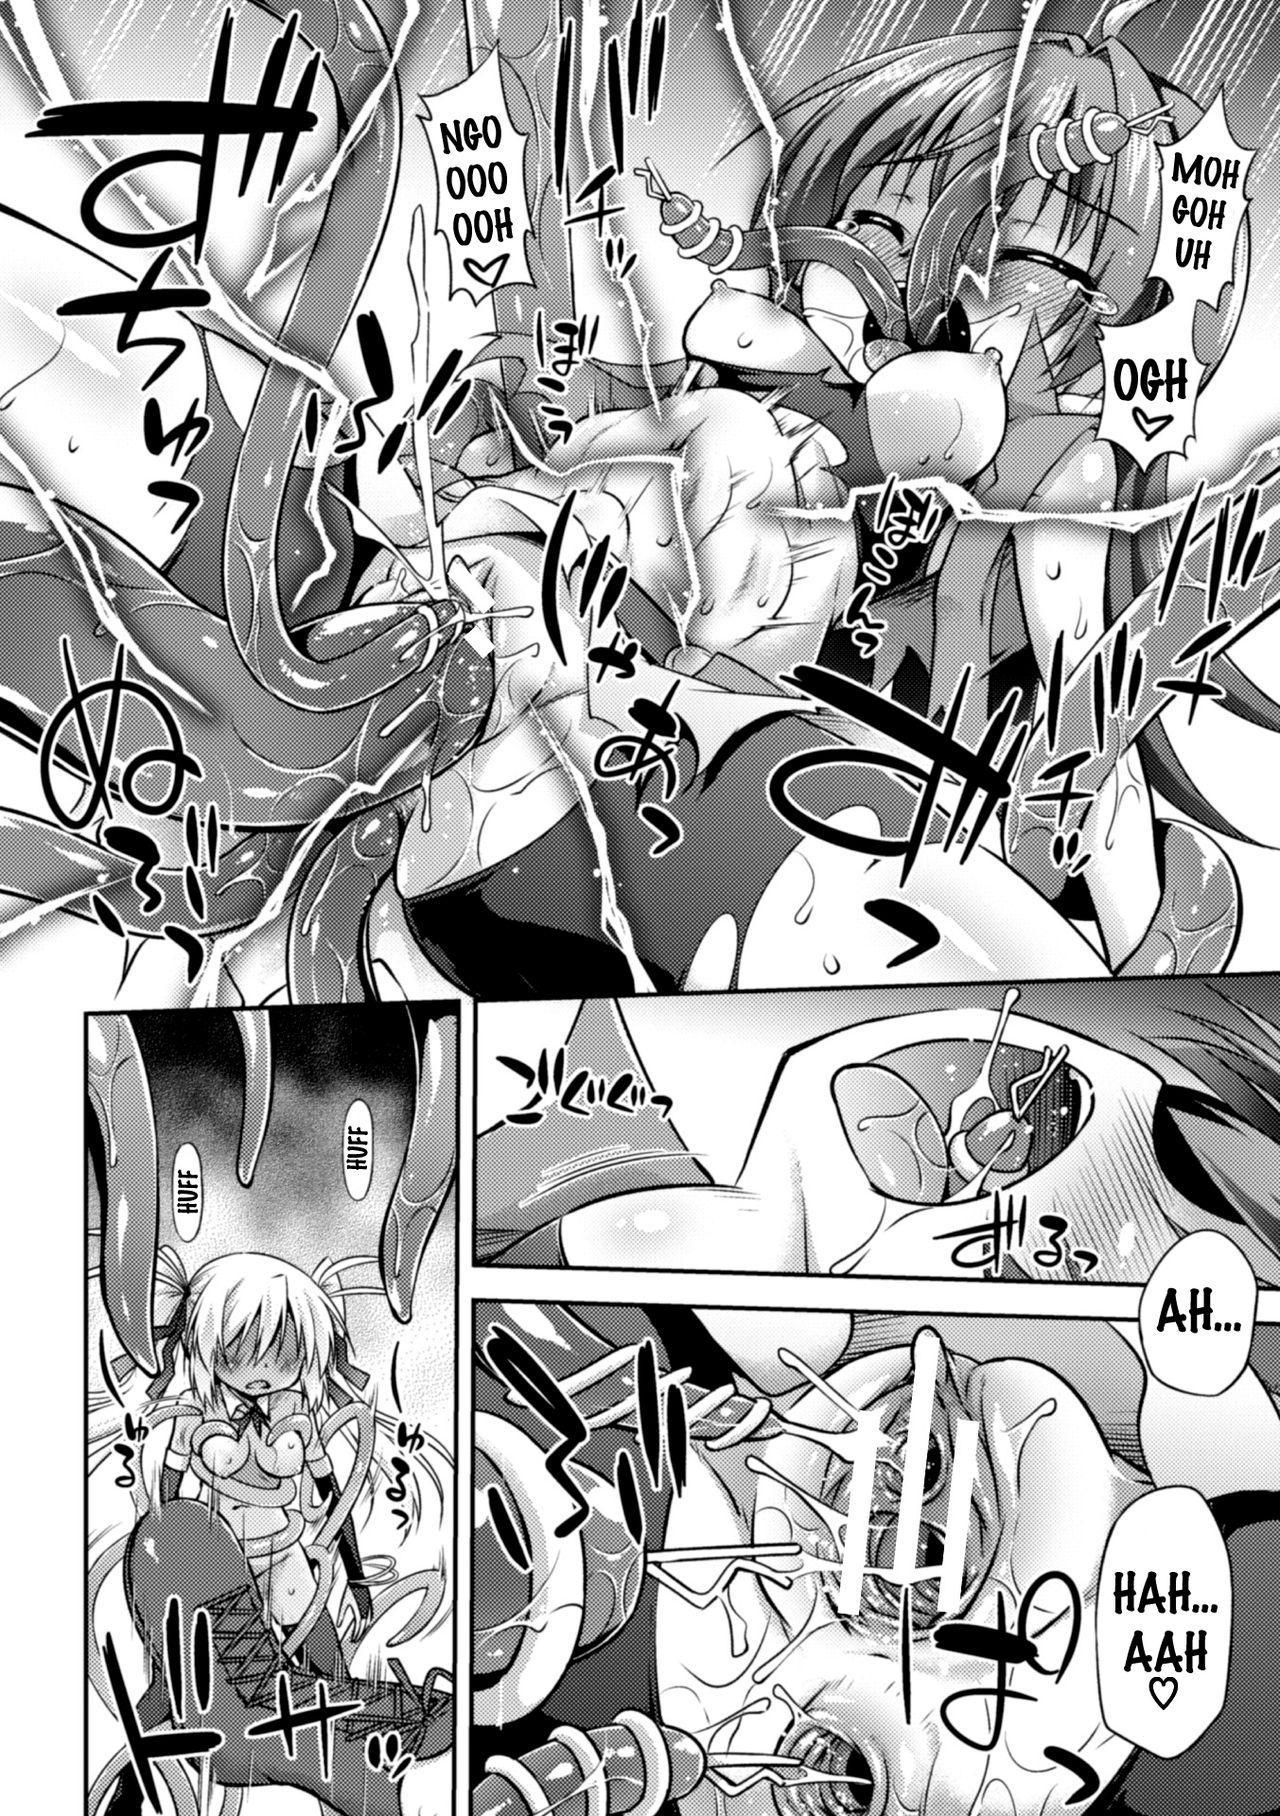 This World is all Tentacles   Konoyo wa Subete Tentacle! 77